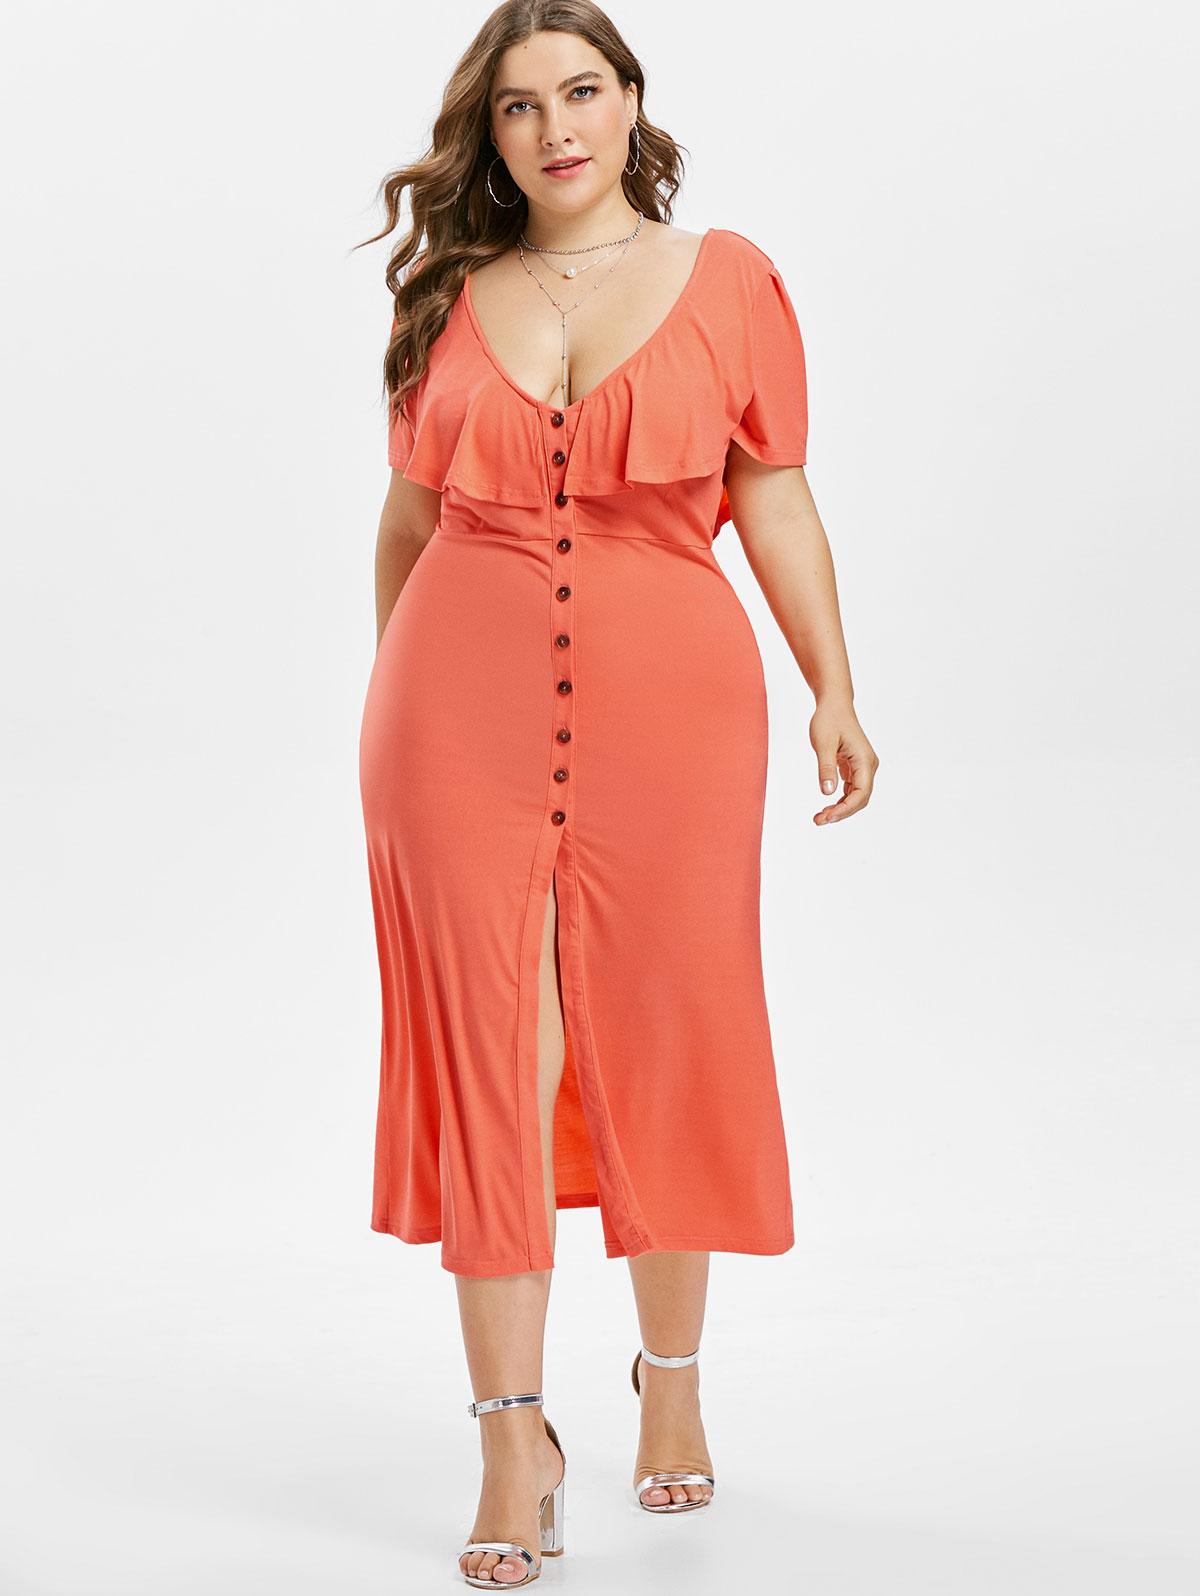 6650fab633 Wipalo Plus Size 5XL Elegant Casual Front Slit Low Cut Dress V Neck Ruffle  Criss Cross Button Dress High Waist Dress Vestidos-in Dresses from Women s  ...